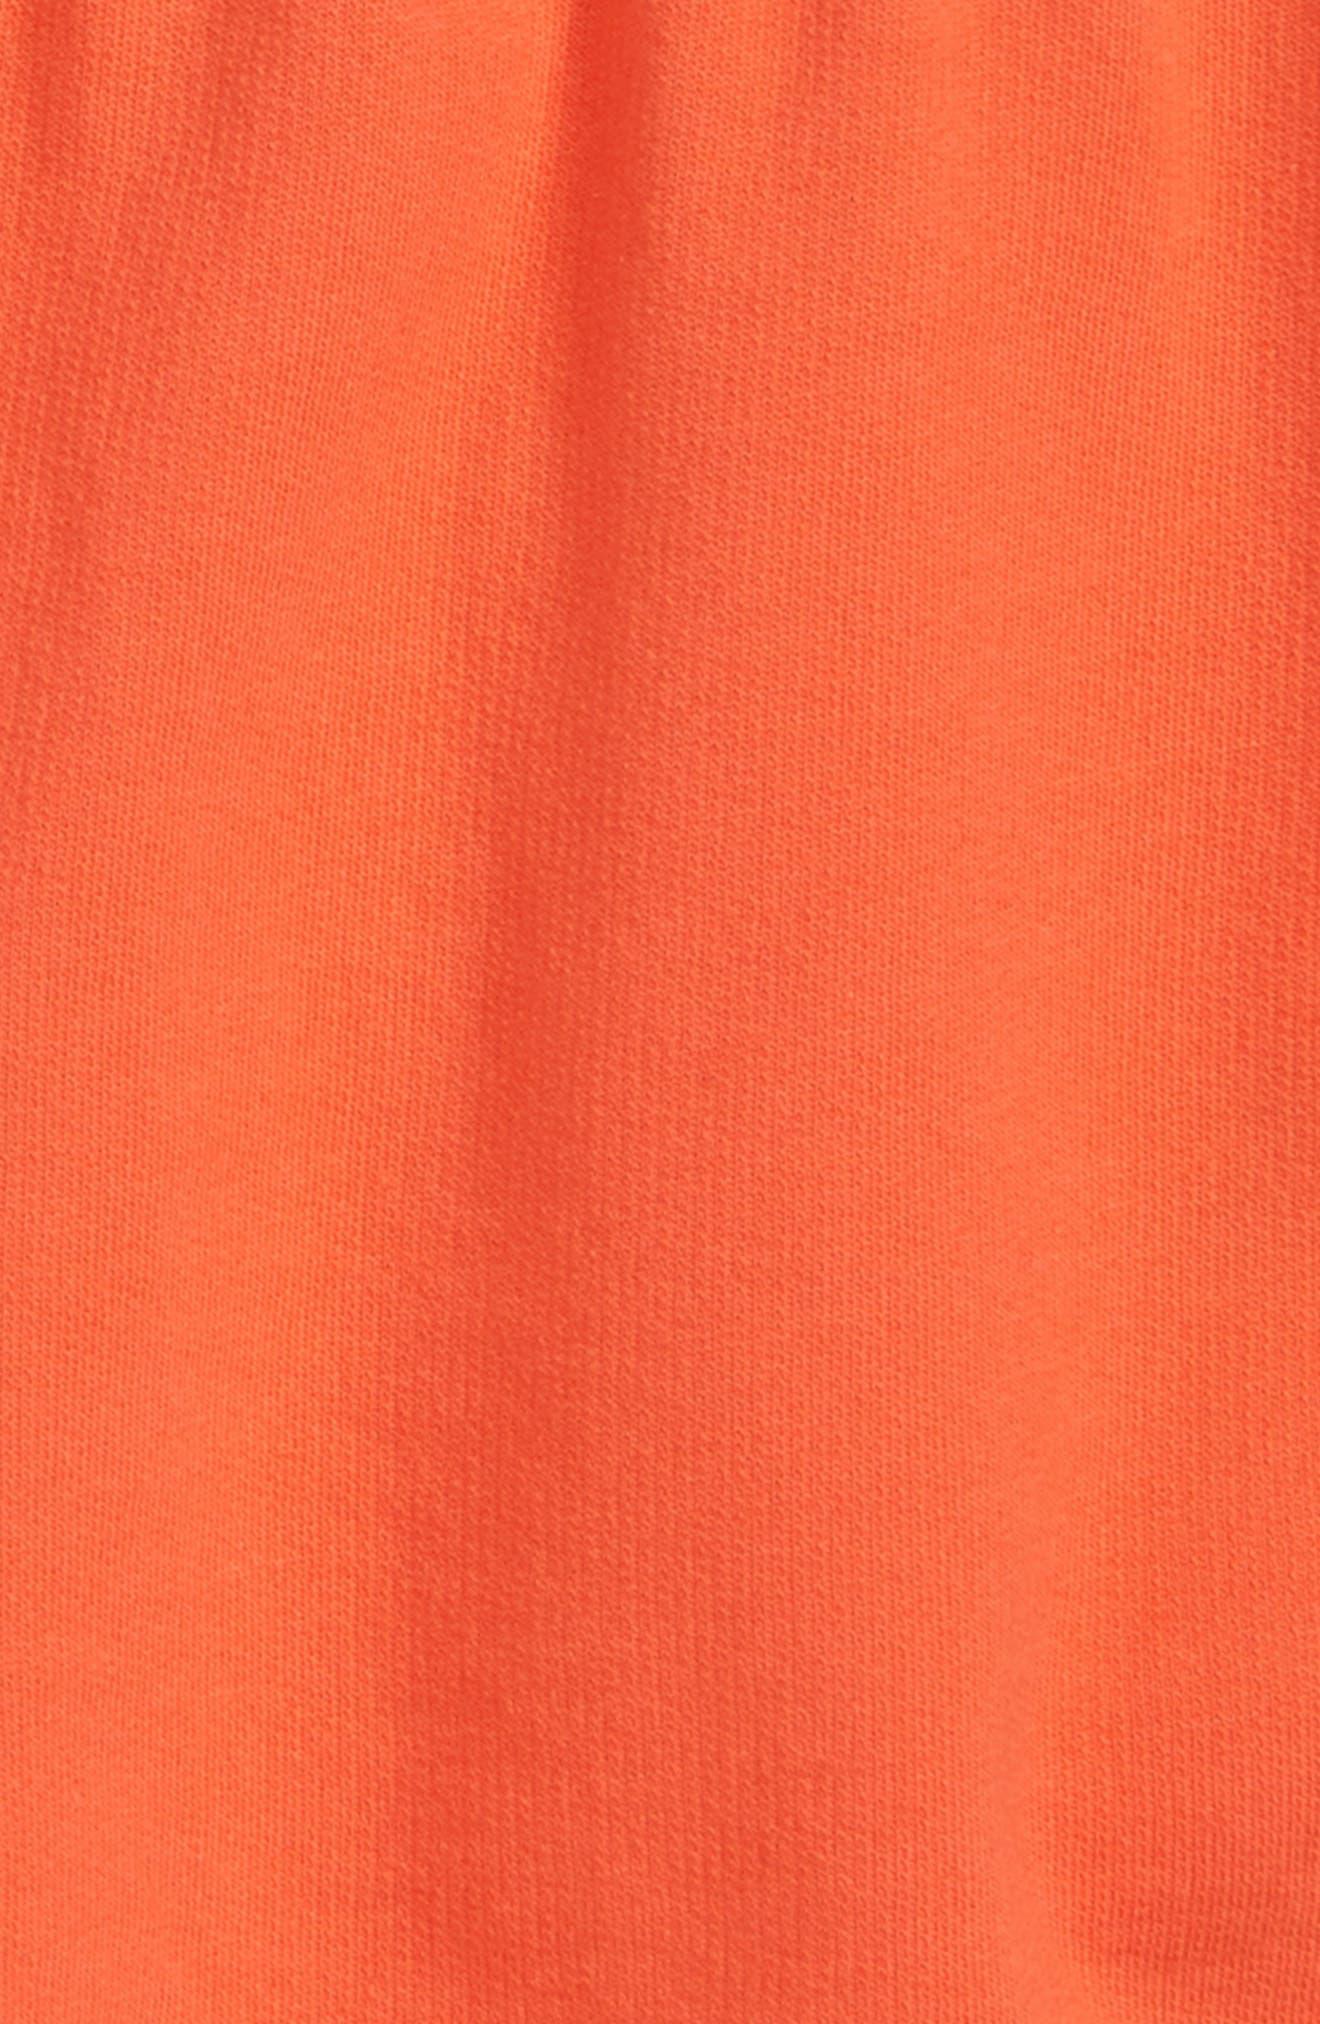 Cotton Dolphin Shorts,                             Alternate thumbnail 12, color,